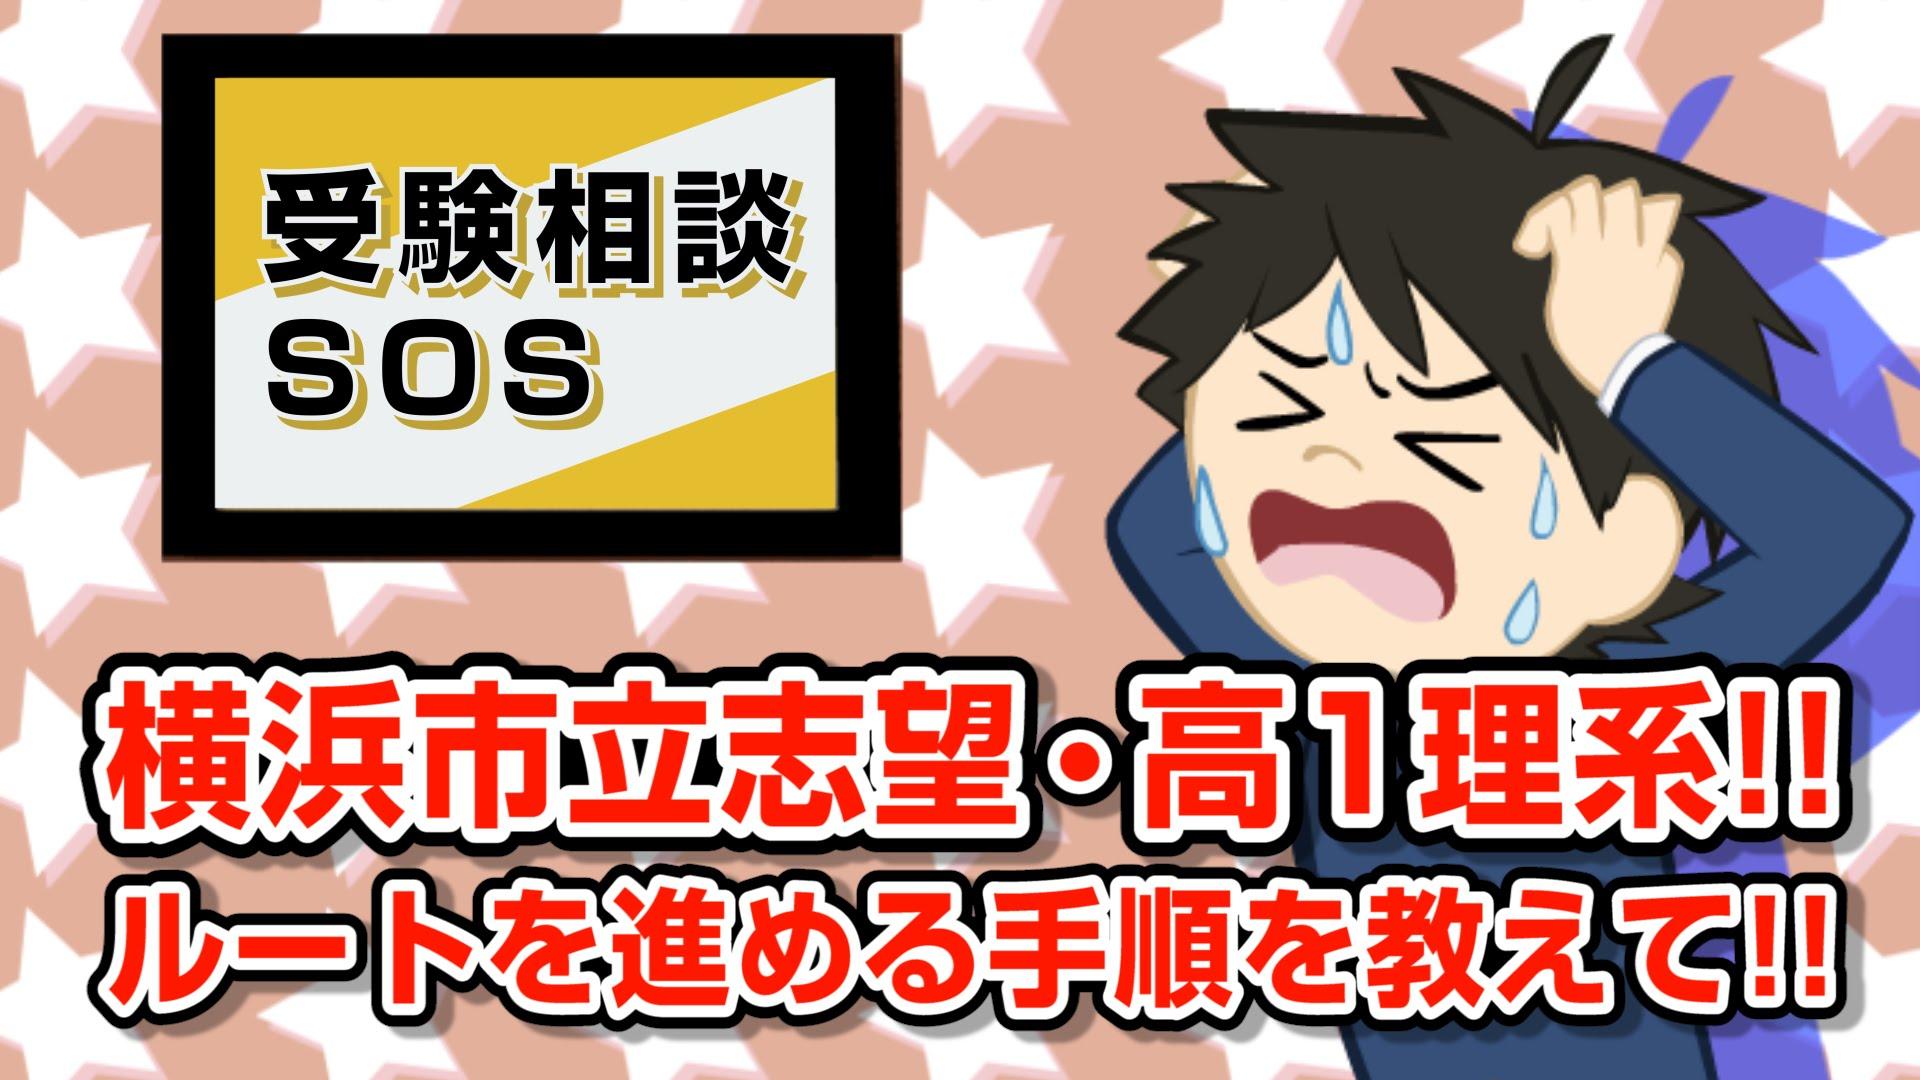 【vol.425】横浜市立大志望・高1理系!! ルートを進める手順を教えて!!|受験相談SOS